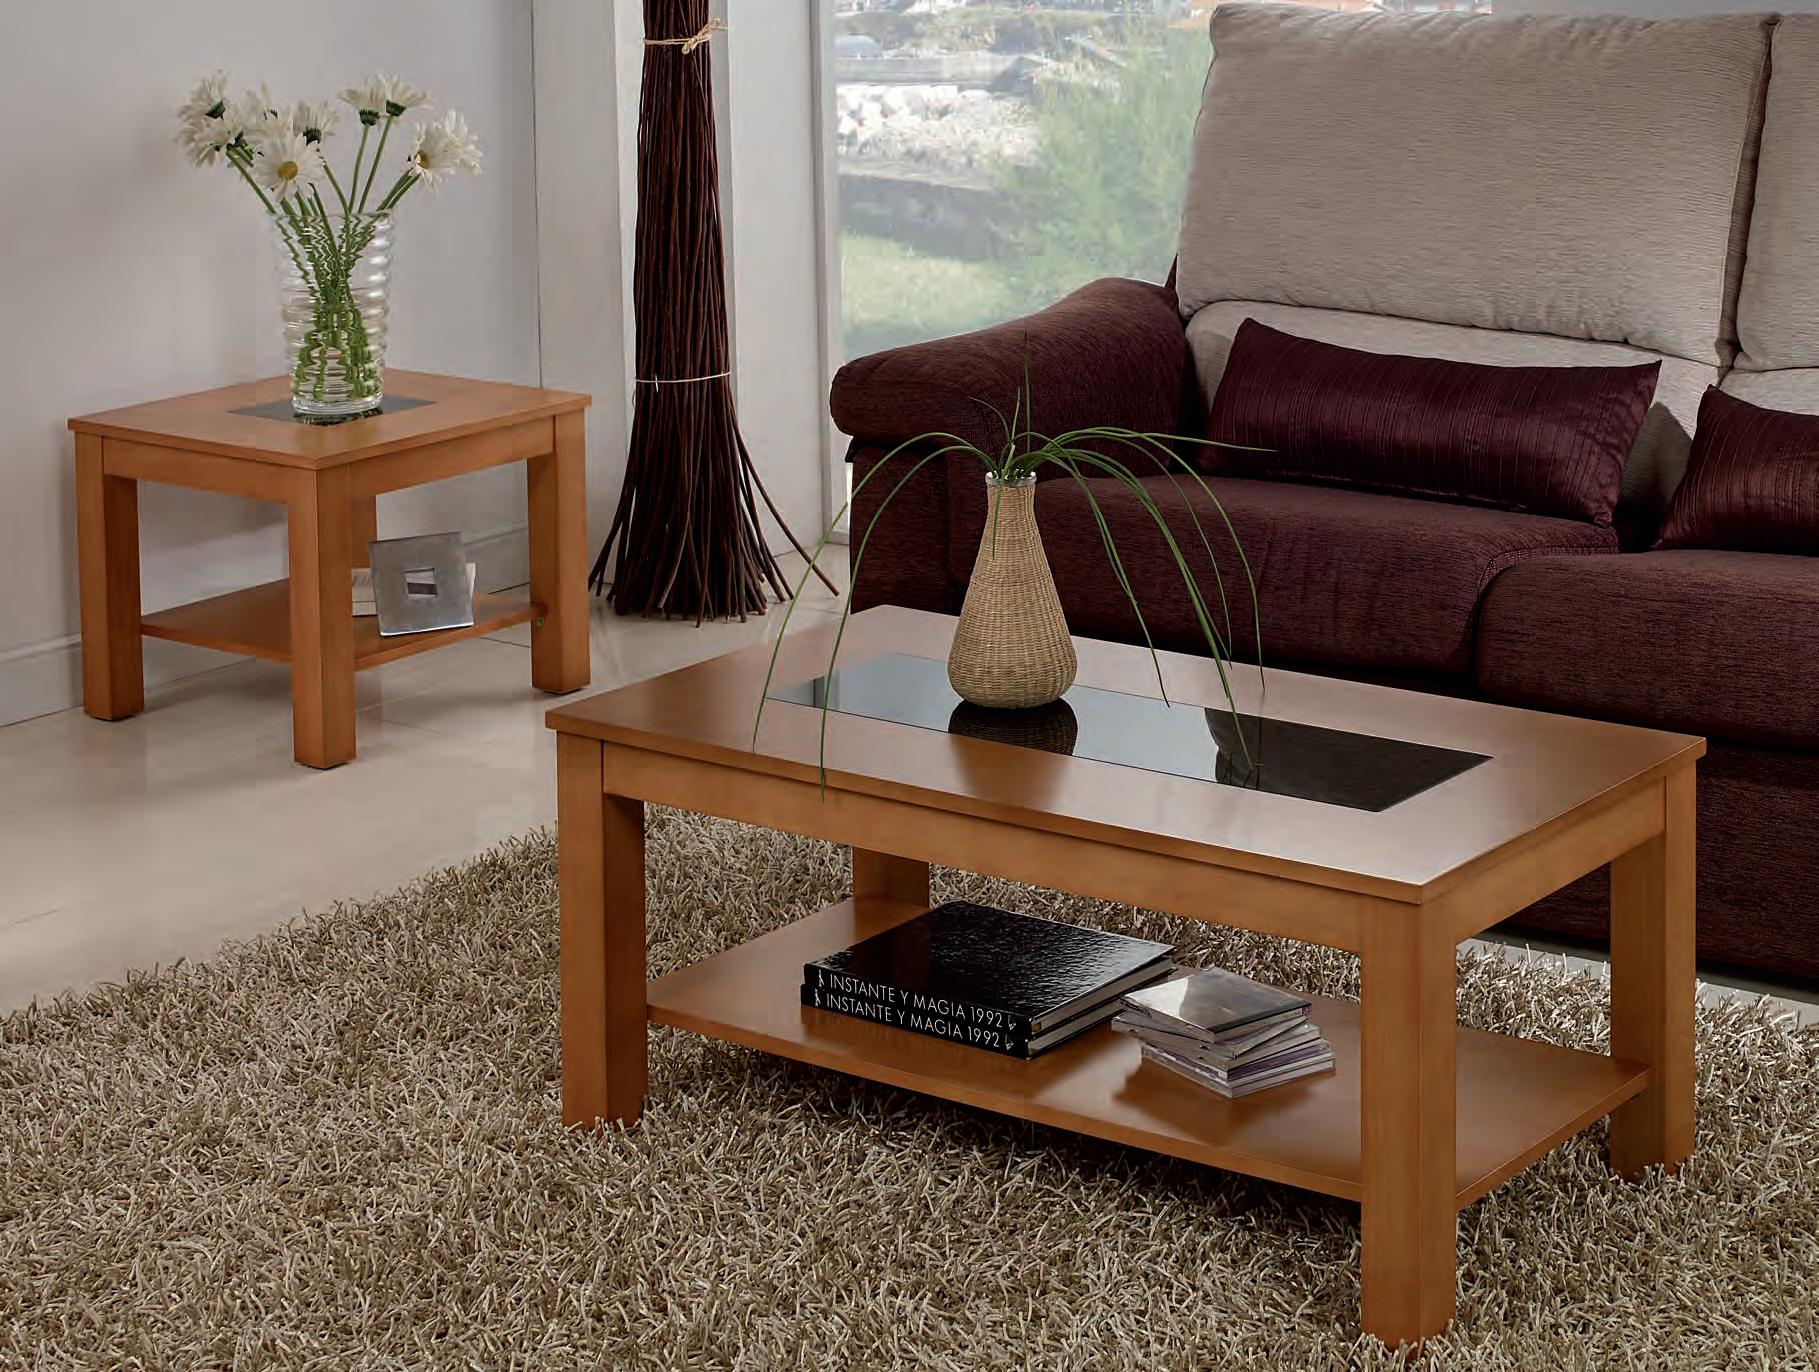 Mesa de rinc n fija 1 cristal muebles adama tienda de - Mesas de rincon ...